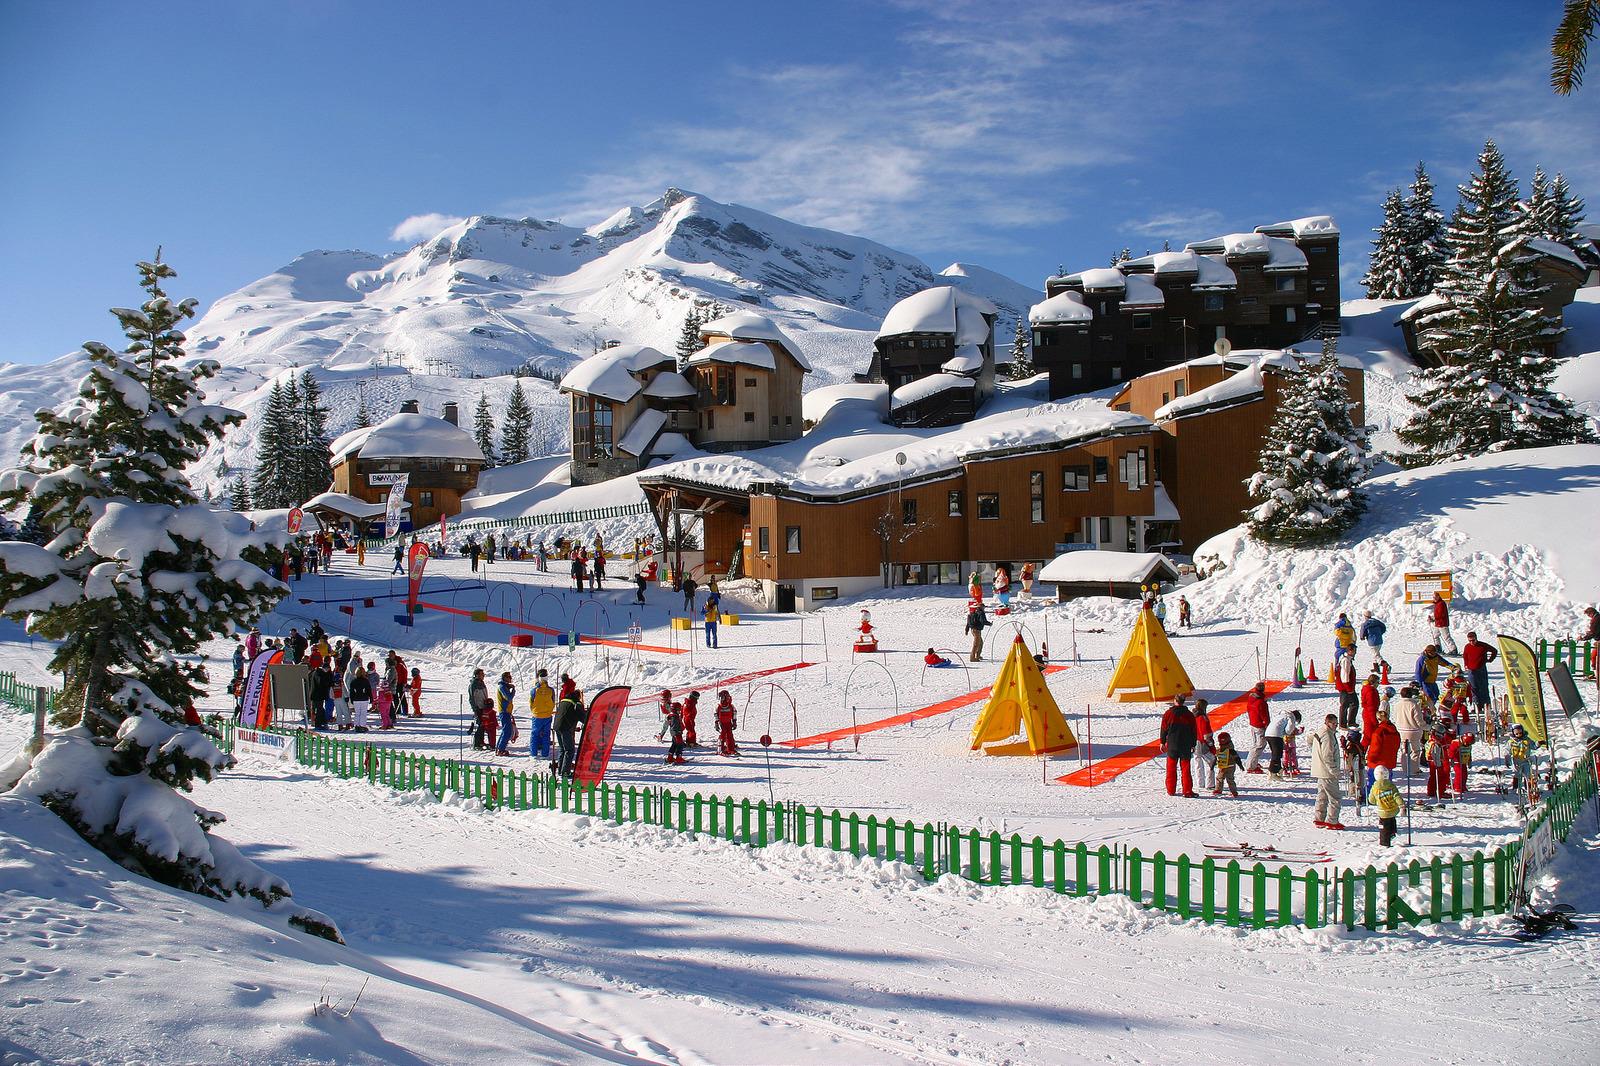 France has the highest number of ski resorts